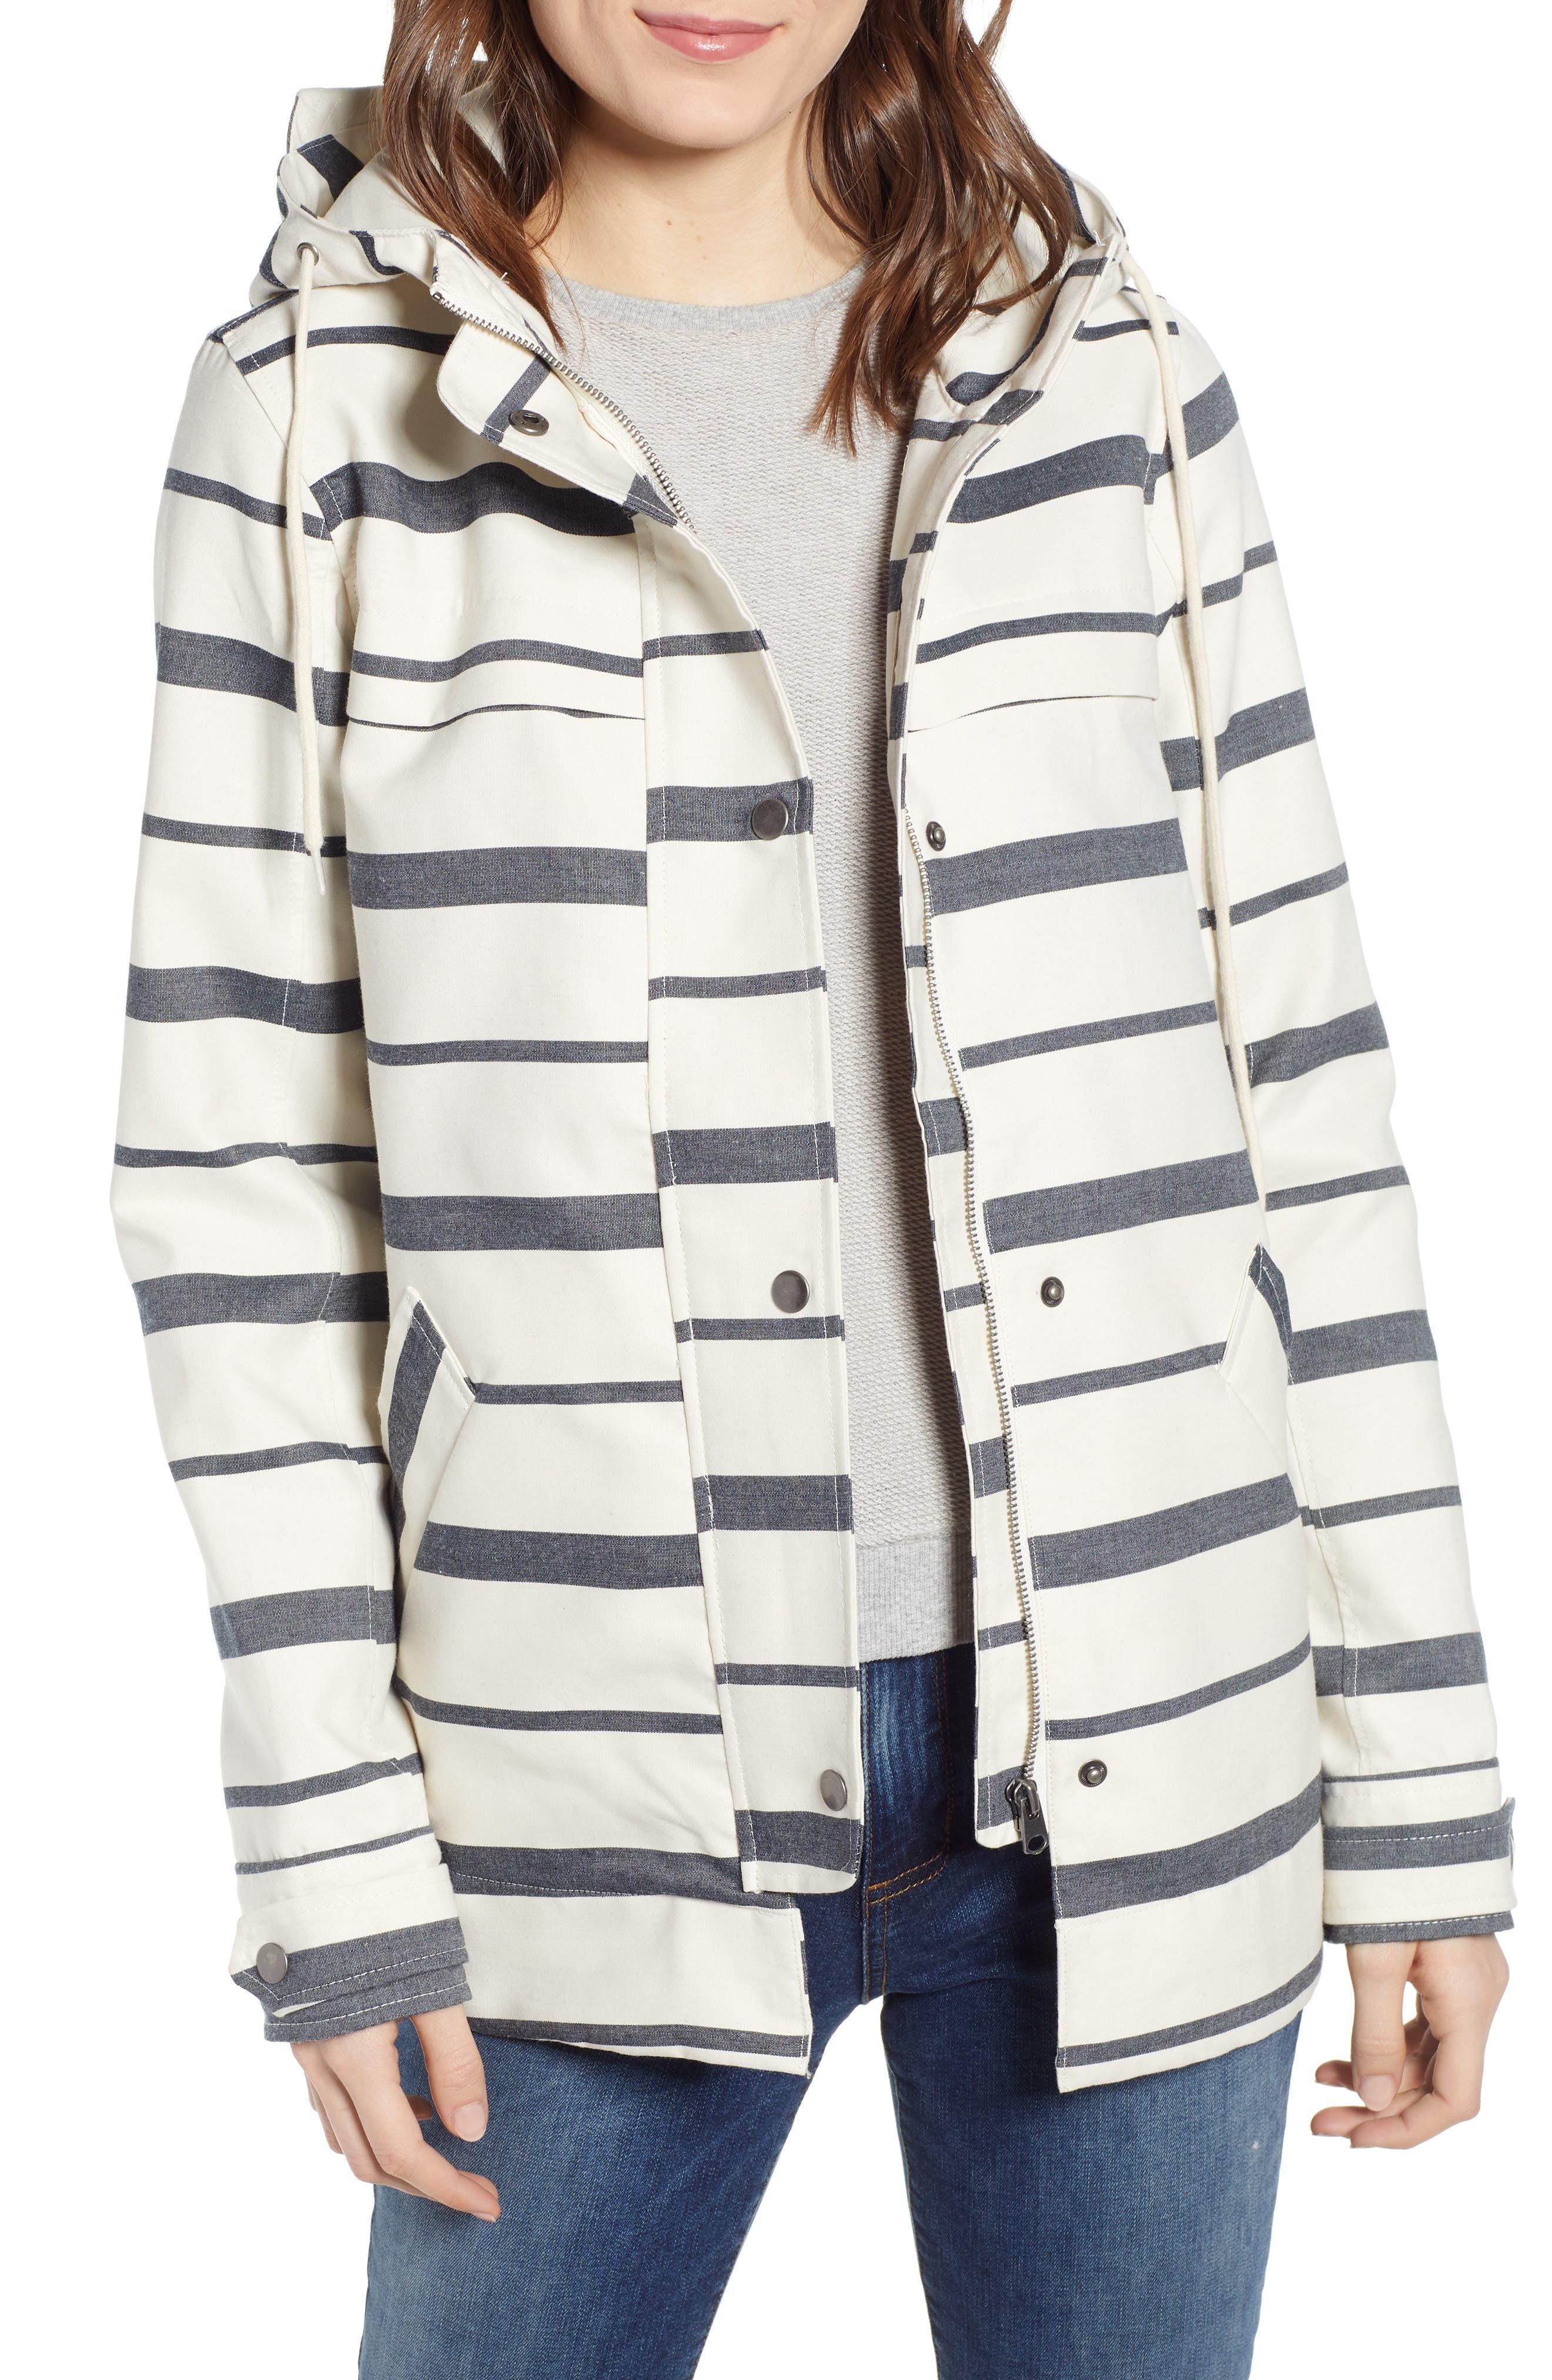 THREAD & SUPPLY Portside Rain Jacket, Main, color, BLACK WHITE STRIPE